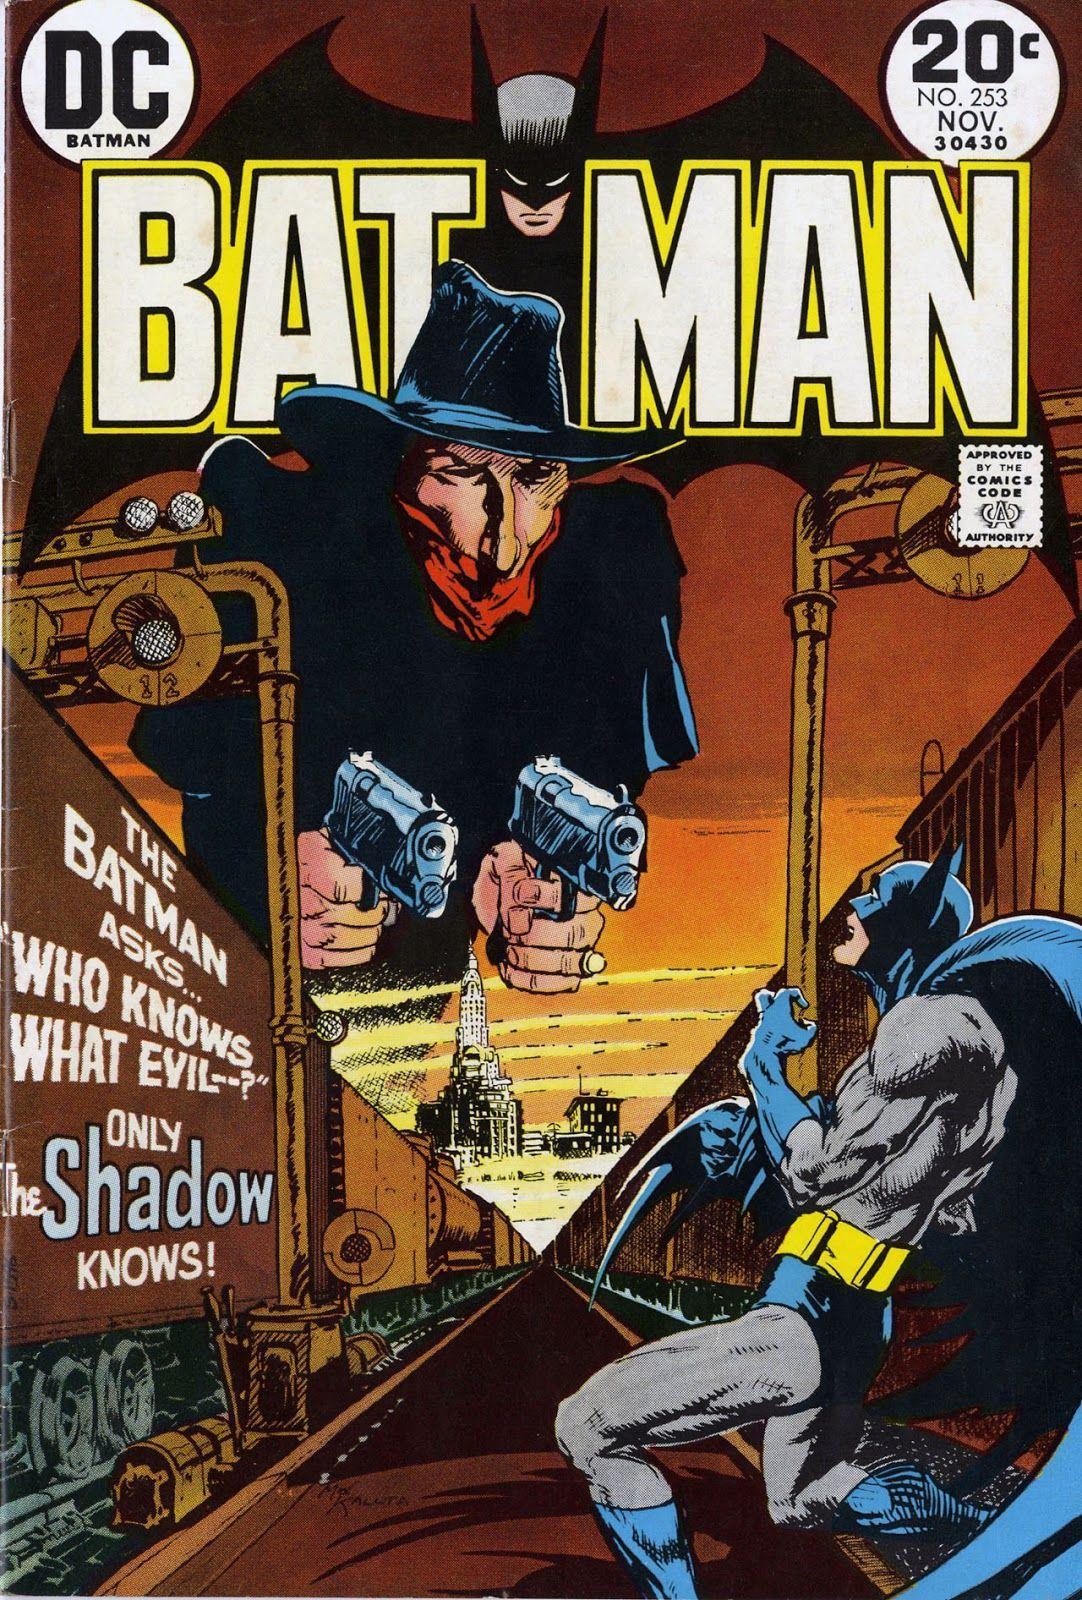 Batman #253 (Writer: Denny O'Neil, Art: Dick Giordano, Irv Novick)